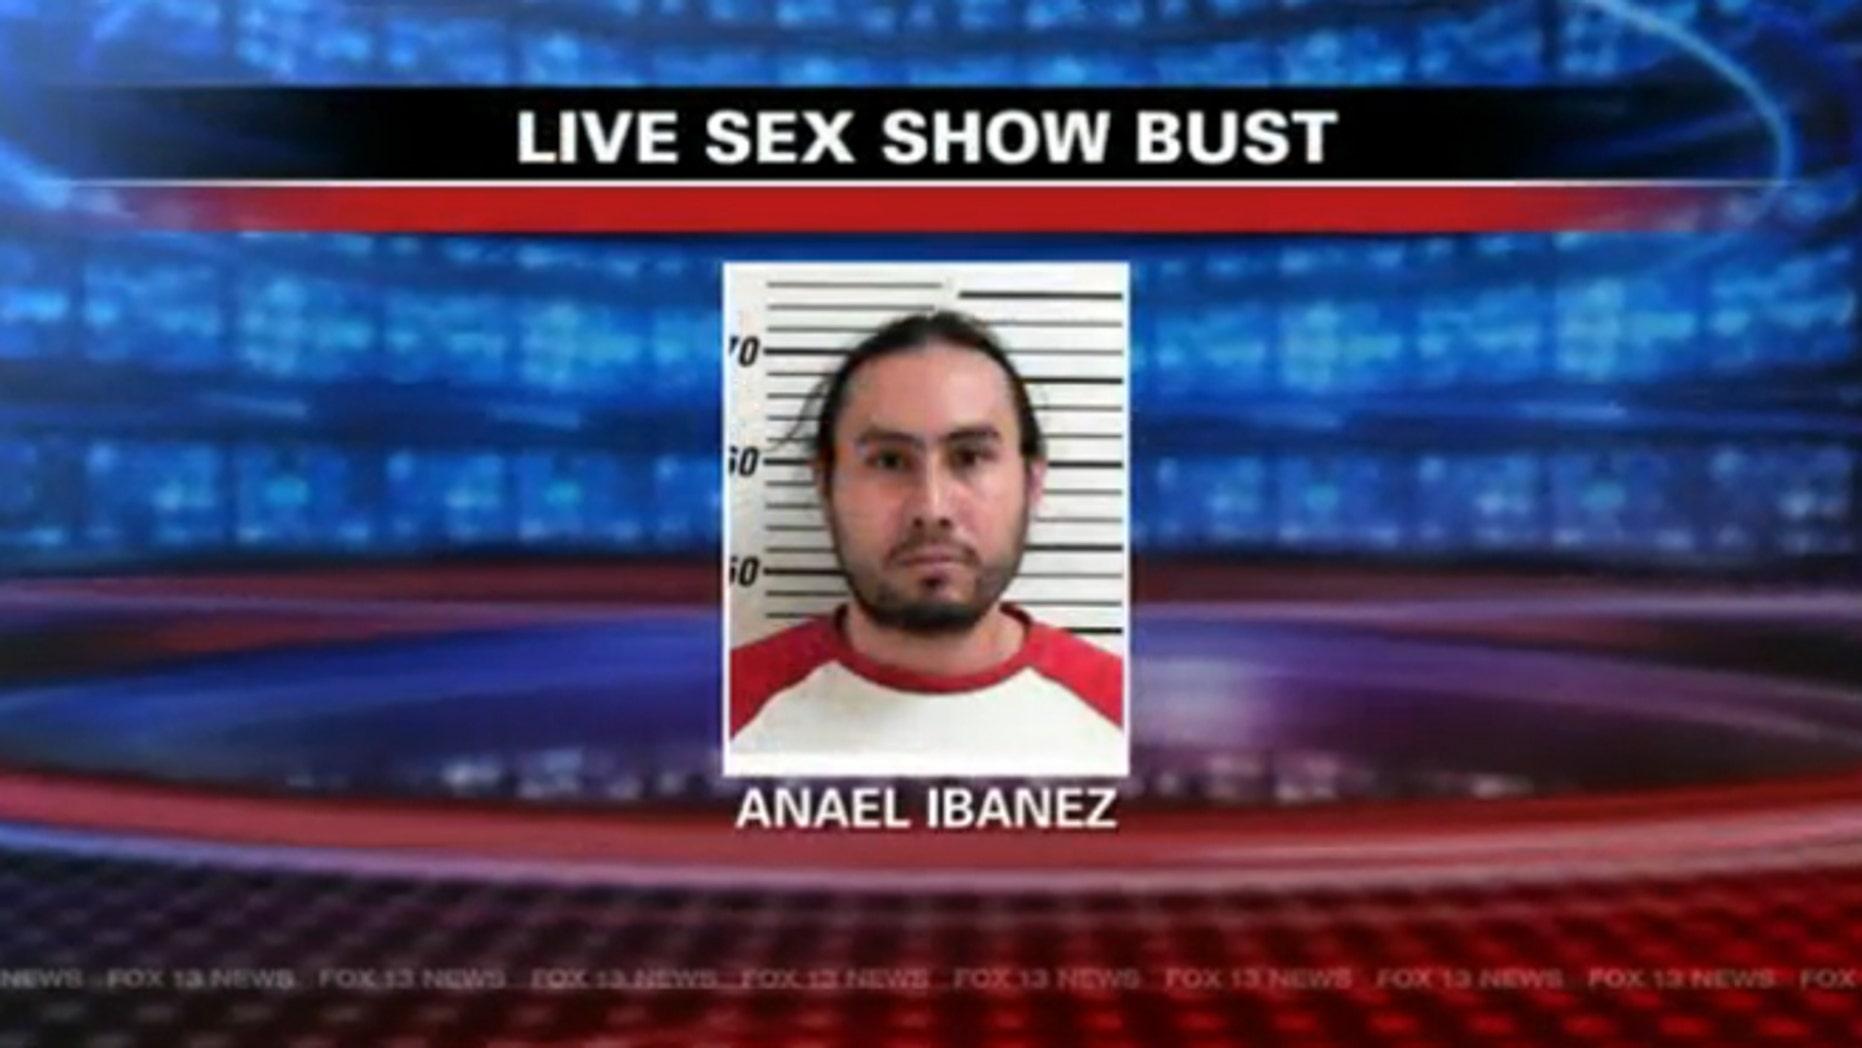 Live sex show video